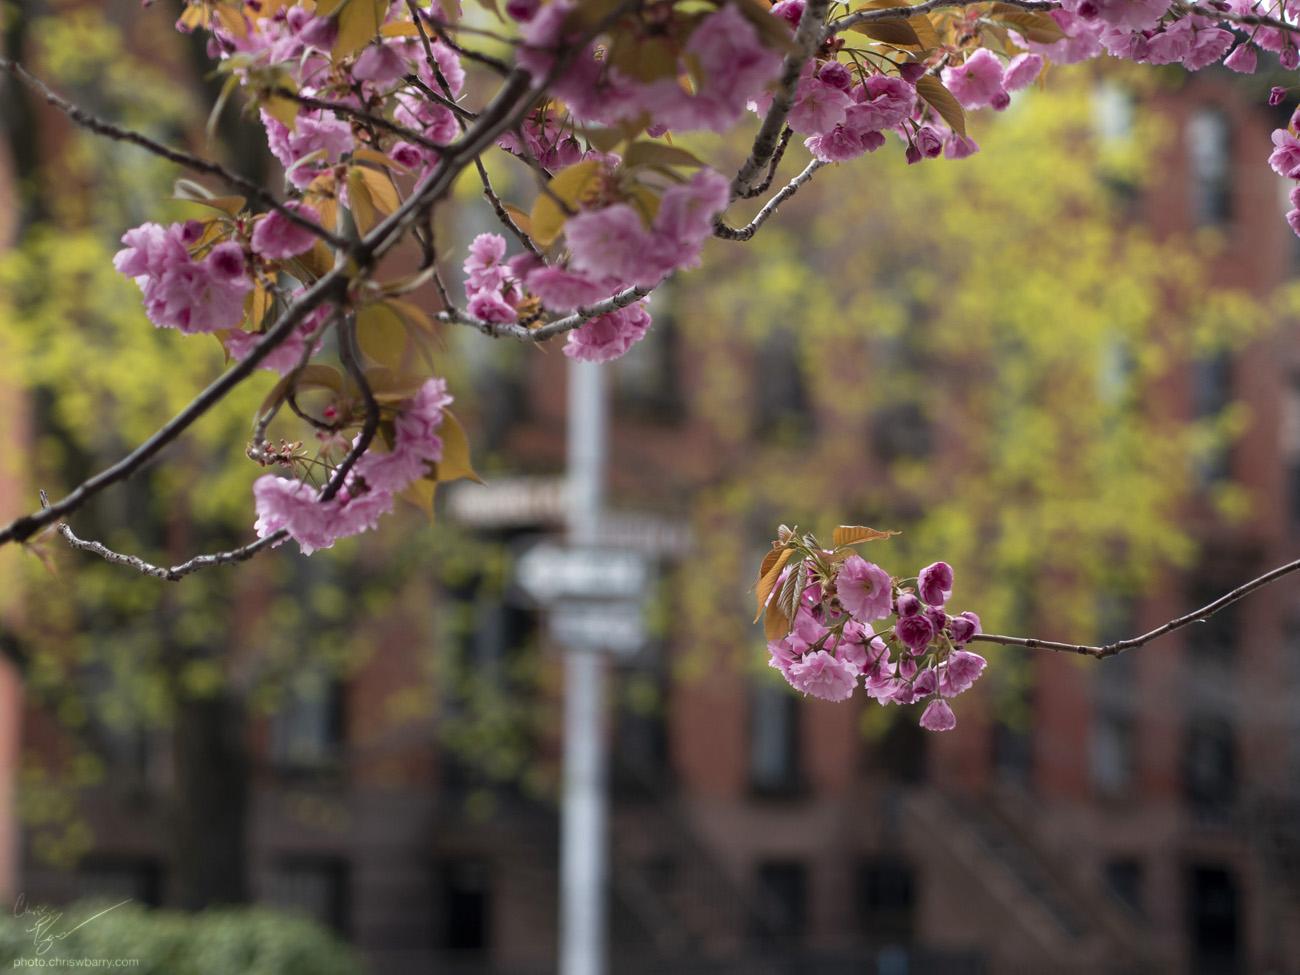 4-29-18: Cherry Blossoms (II)